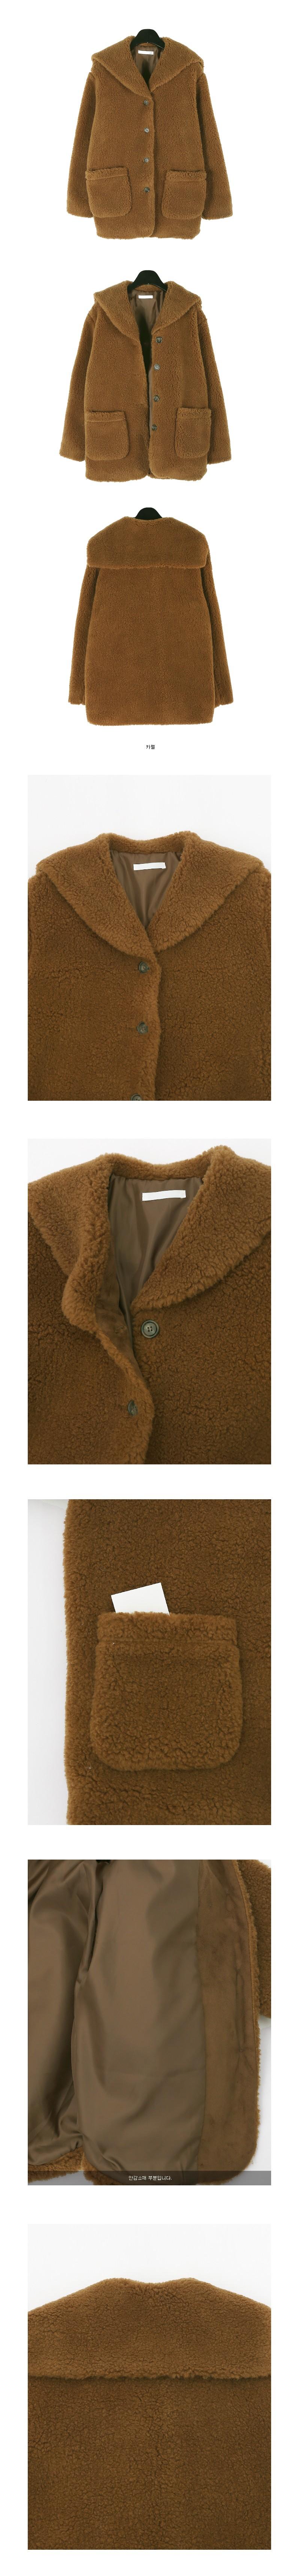 Sailor fuzzy warm jacket